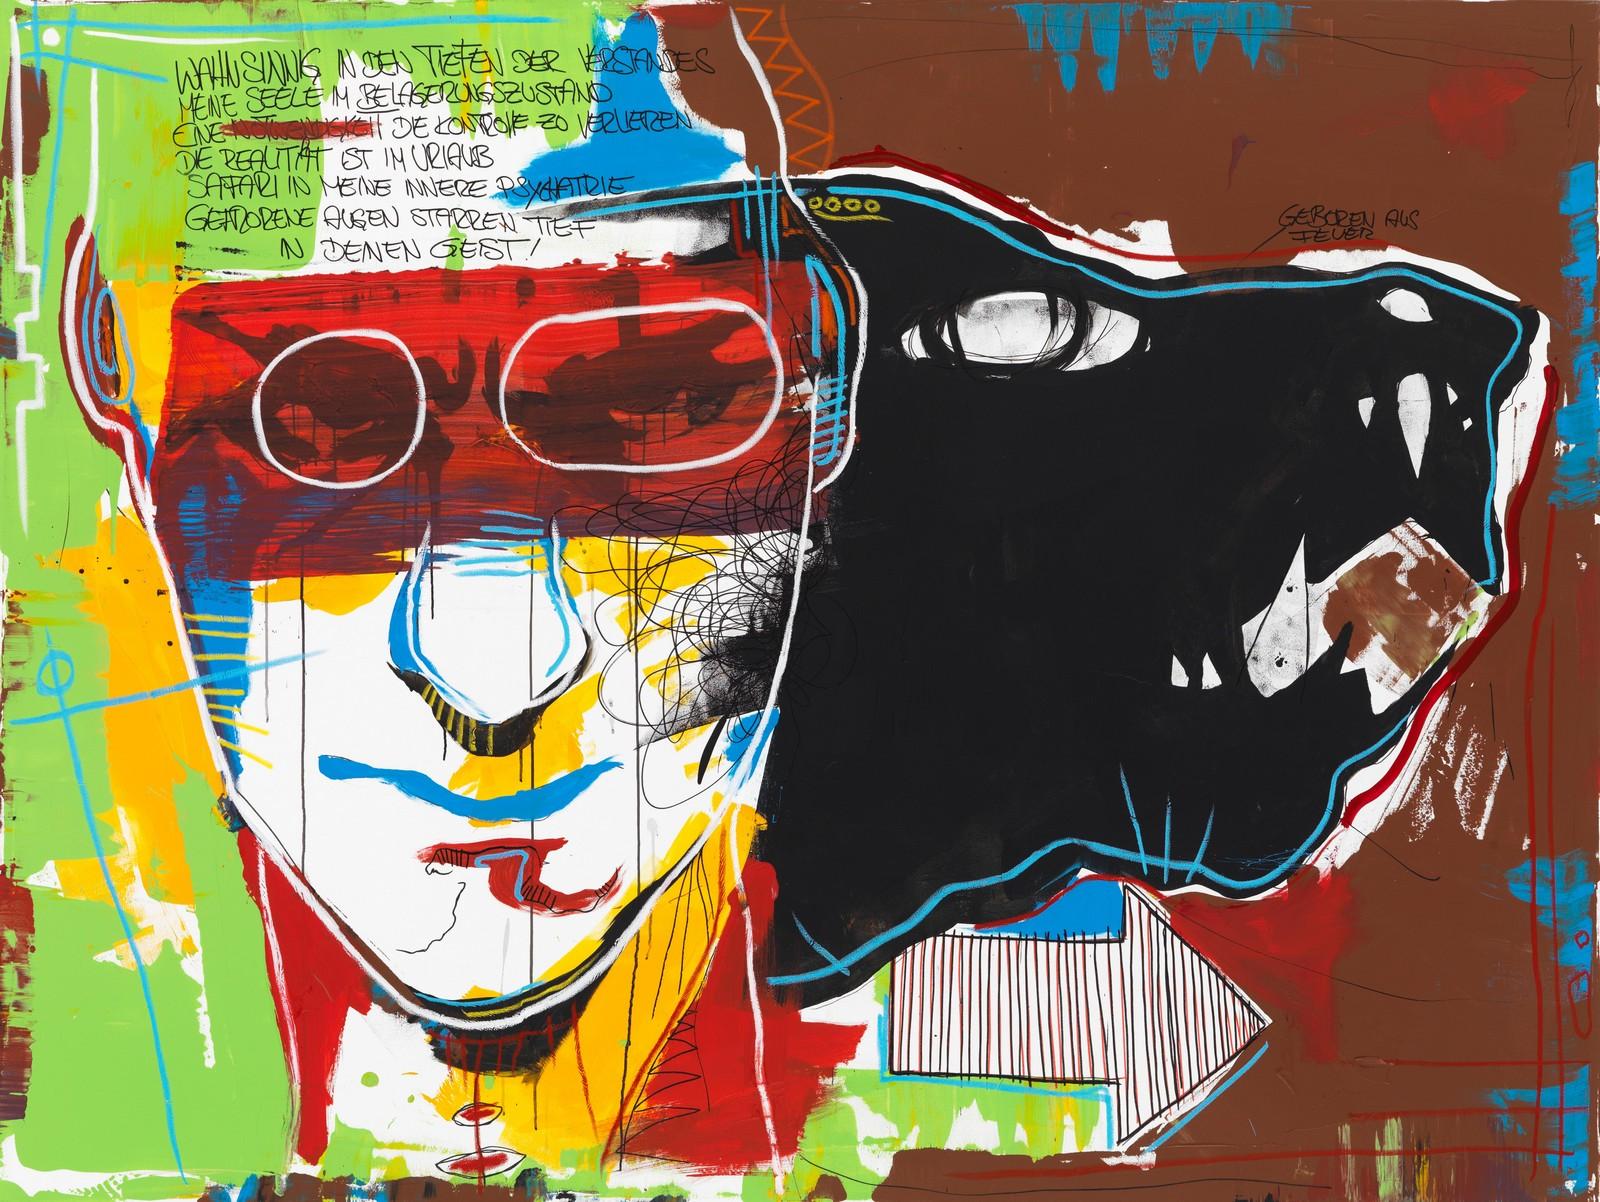 2013, acrylic and chalk on canvas, 180 x 240 cm